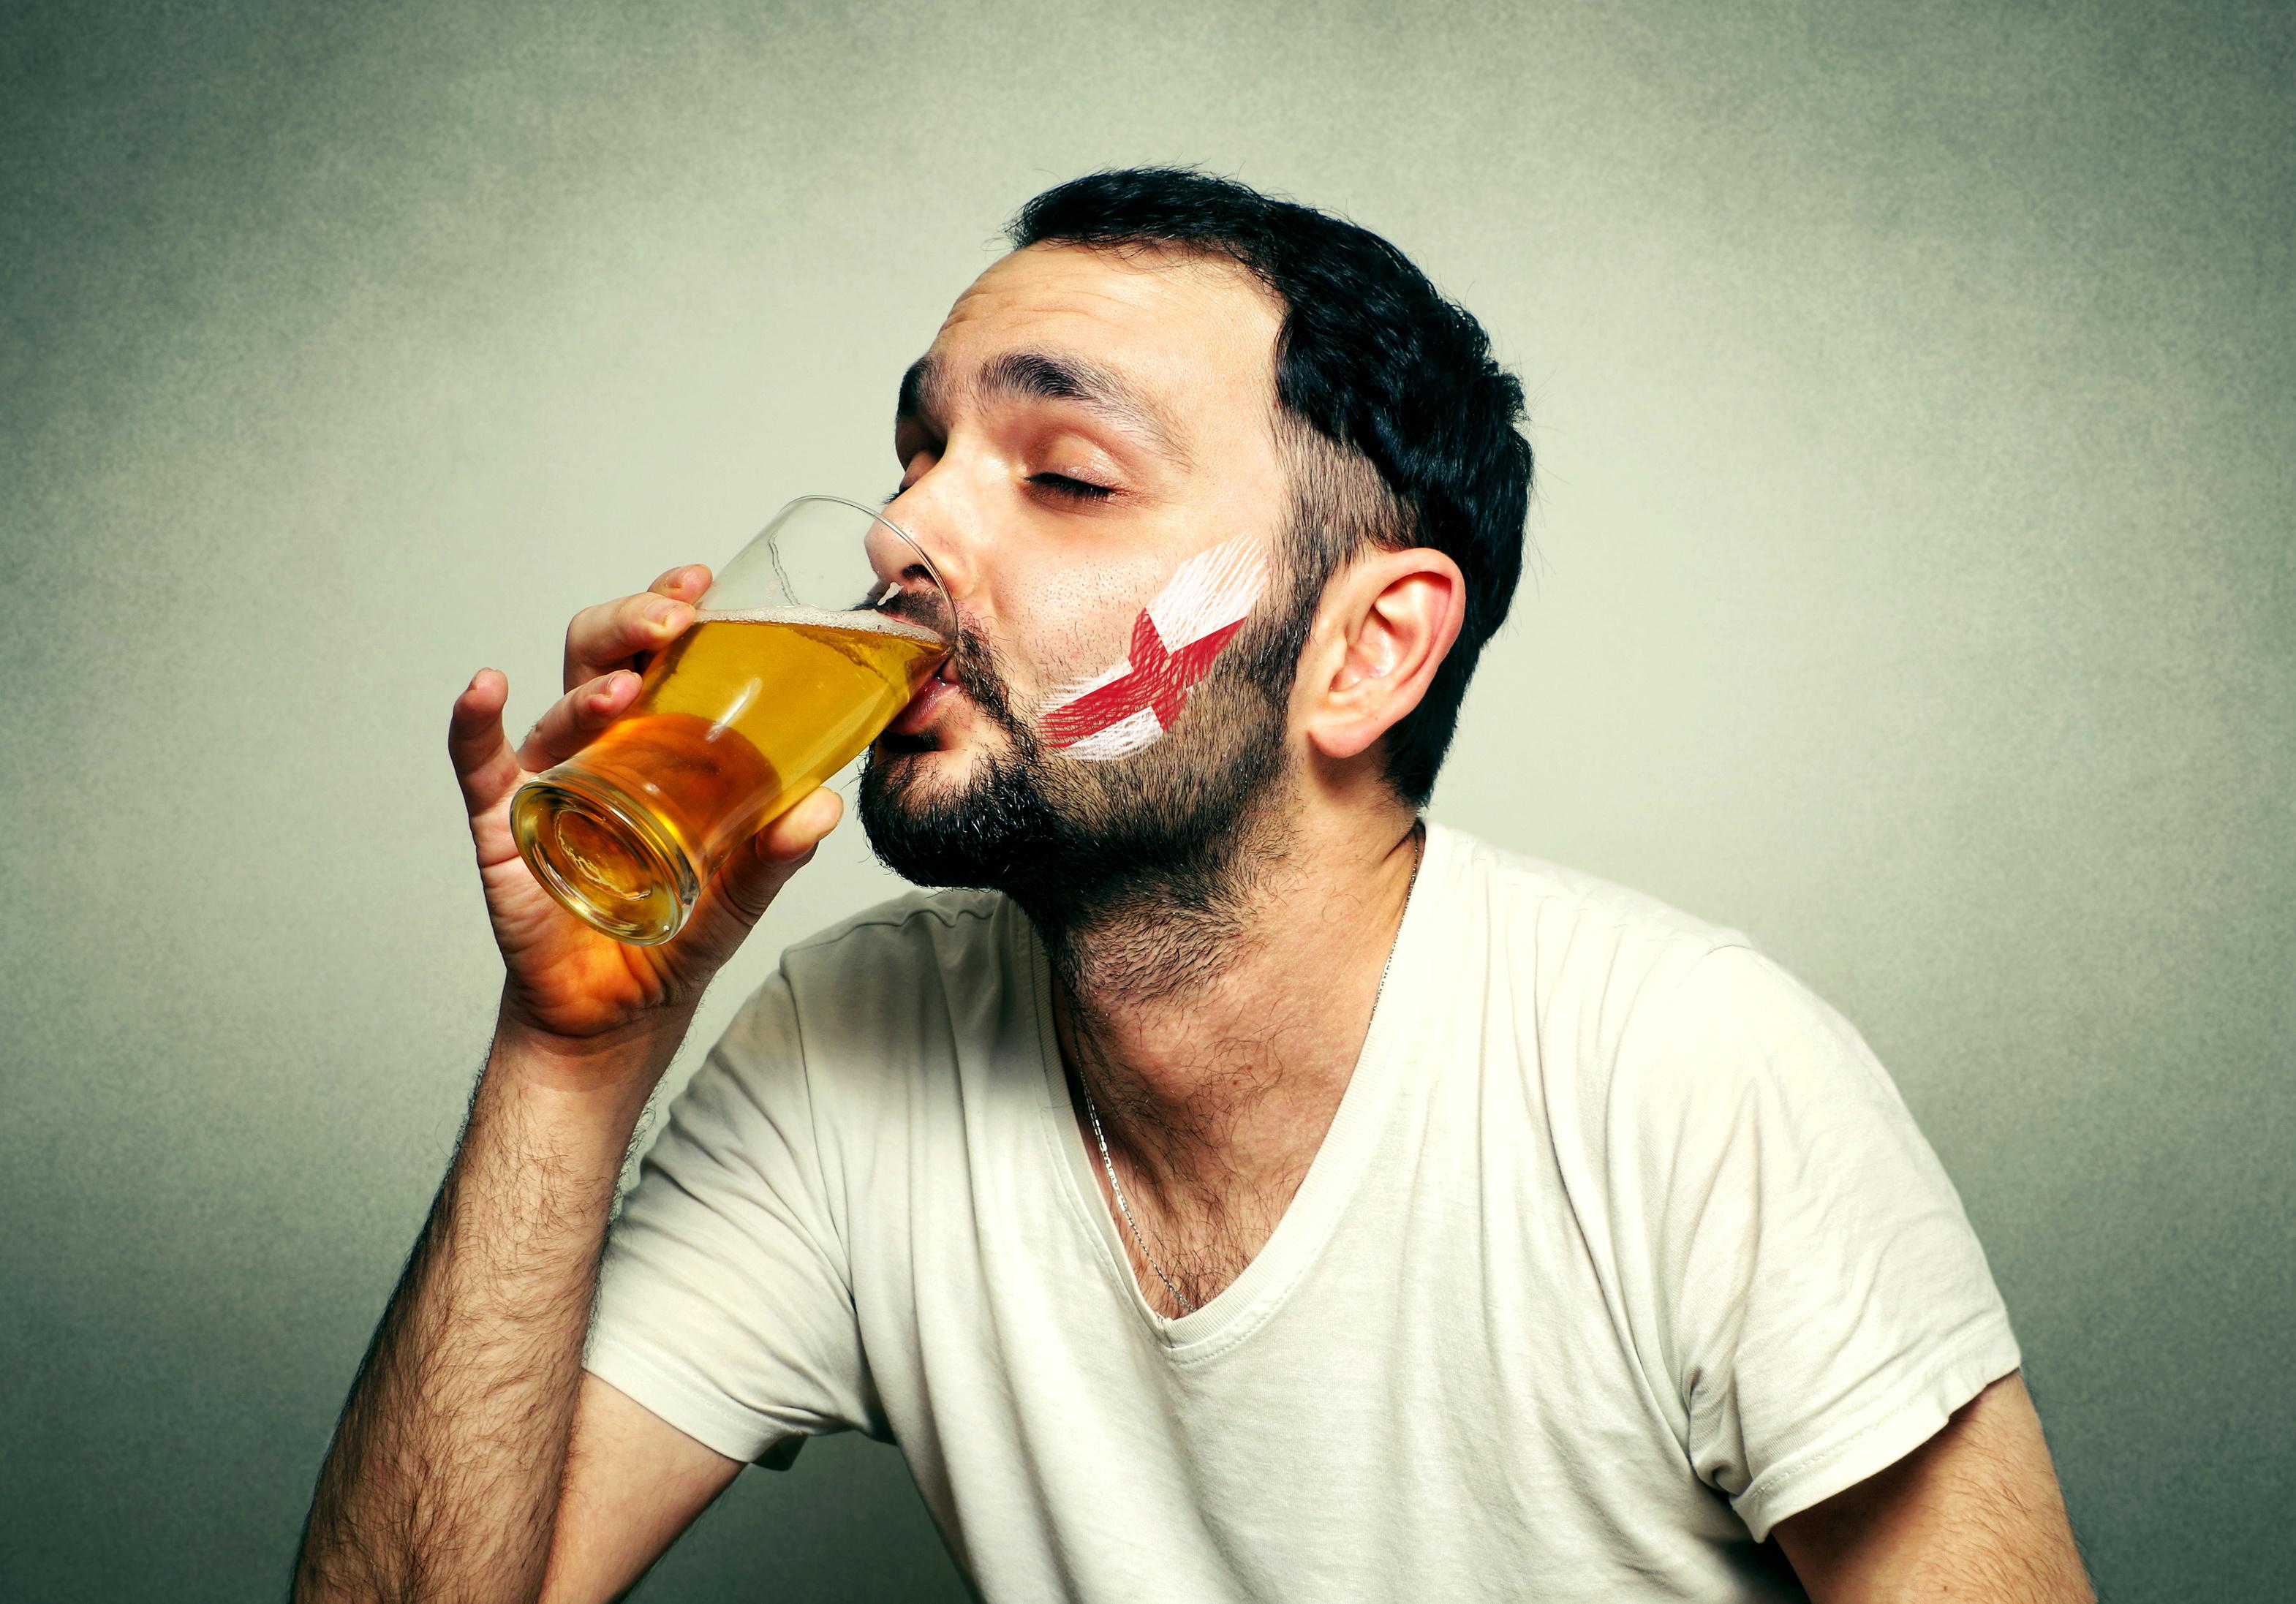 JD Wetherspoons Hypocrites Over England Match Beer Pricing